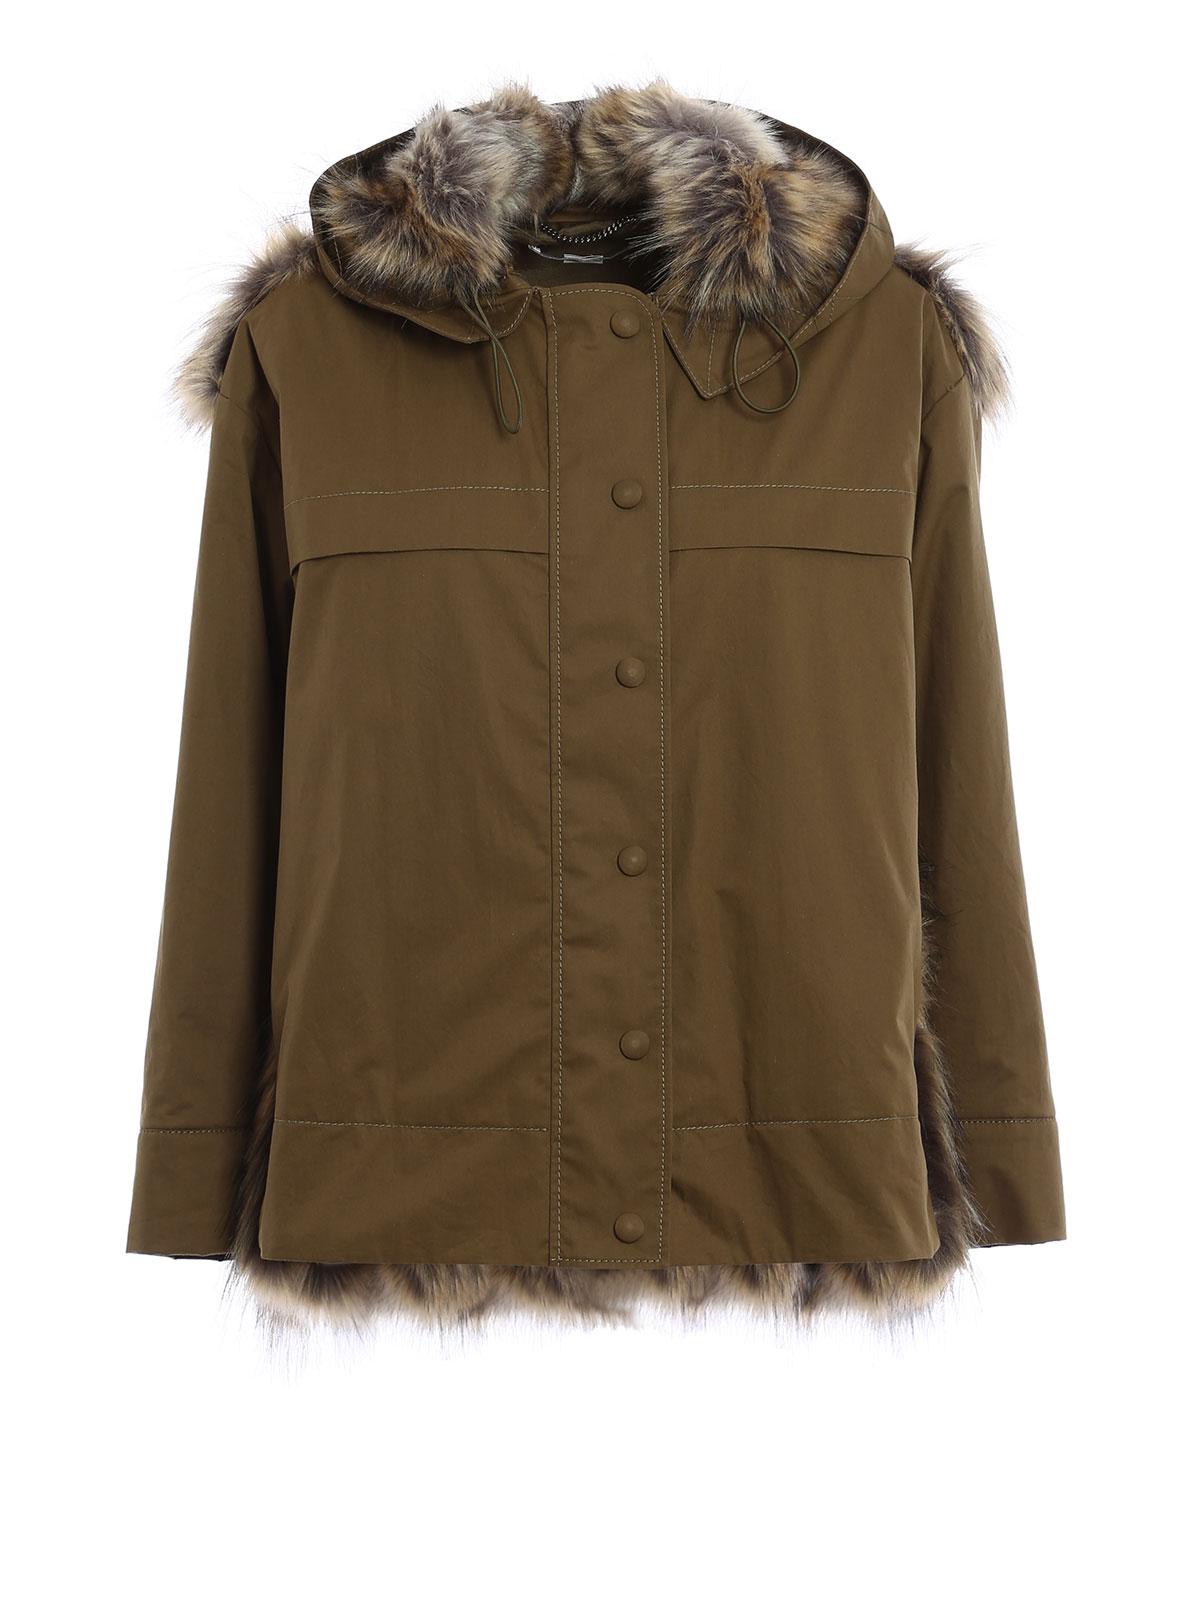 Stella Mccartney: casual jackets - Eco friendly fur panelled jacket